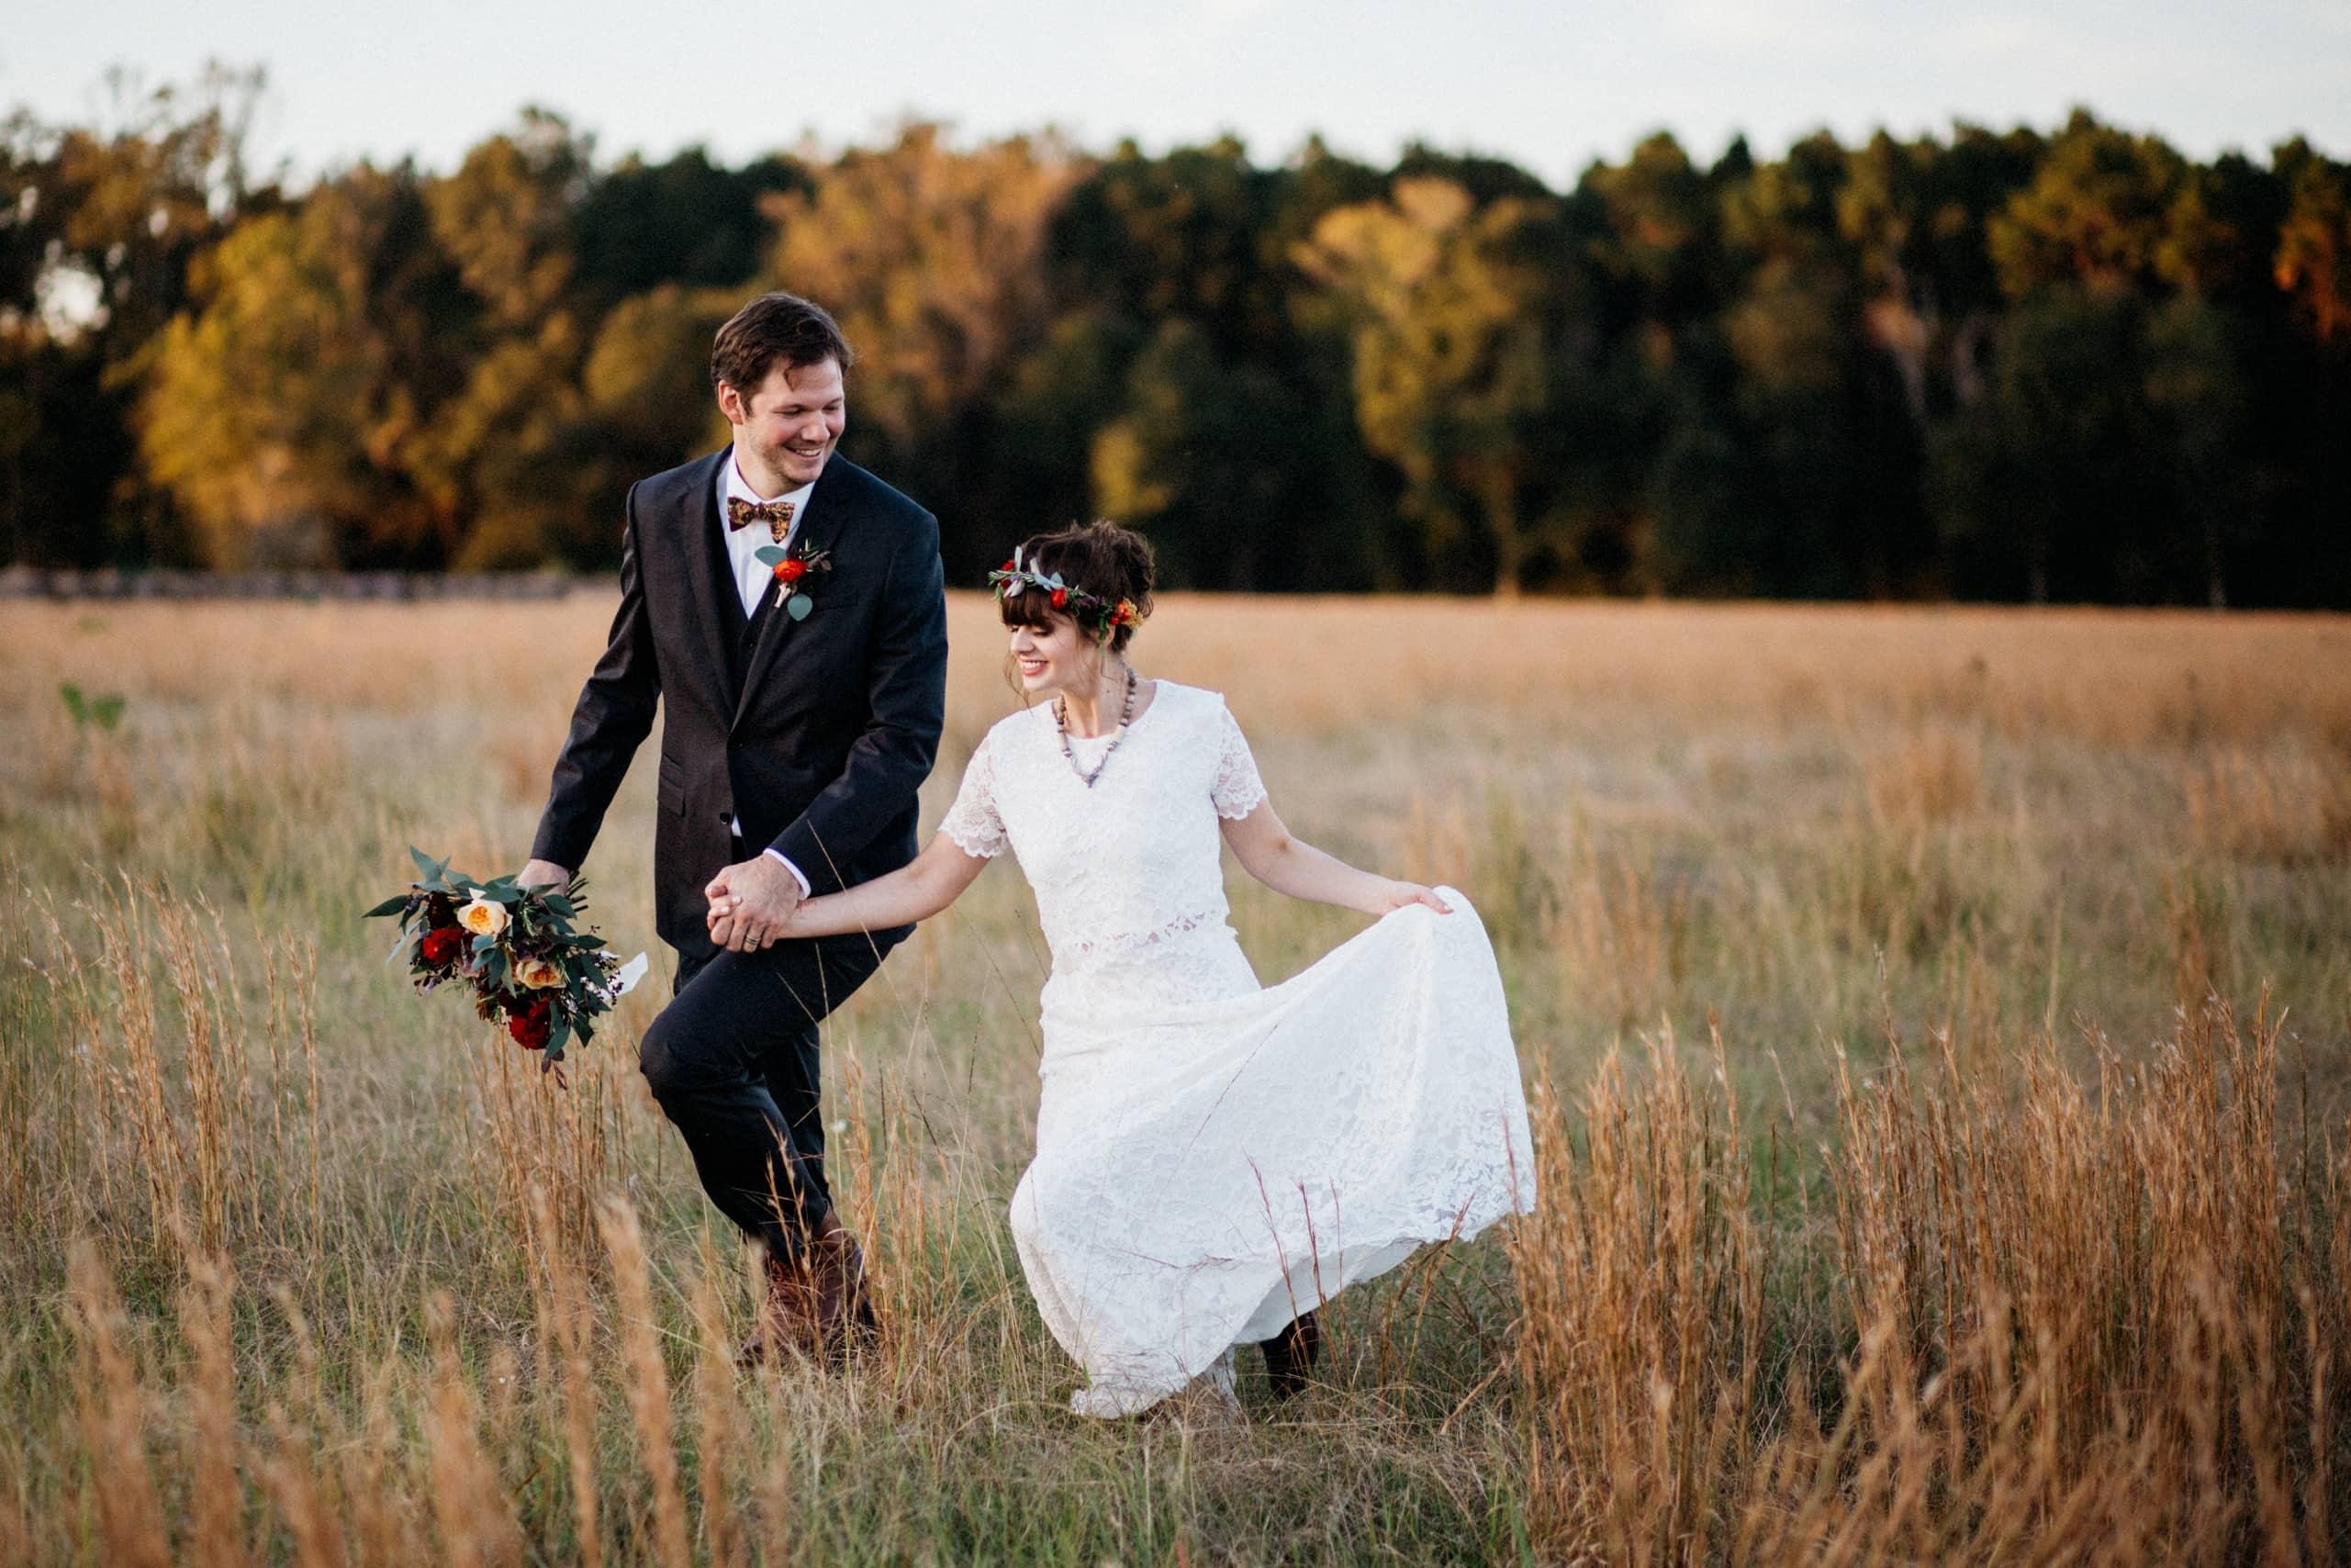 Southern_Surprise_Wedding_0121